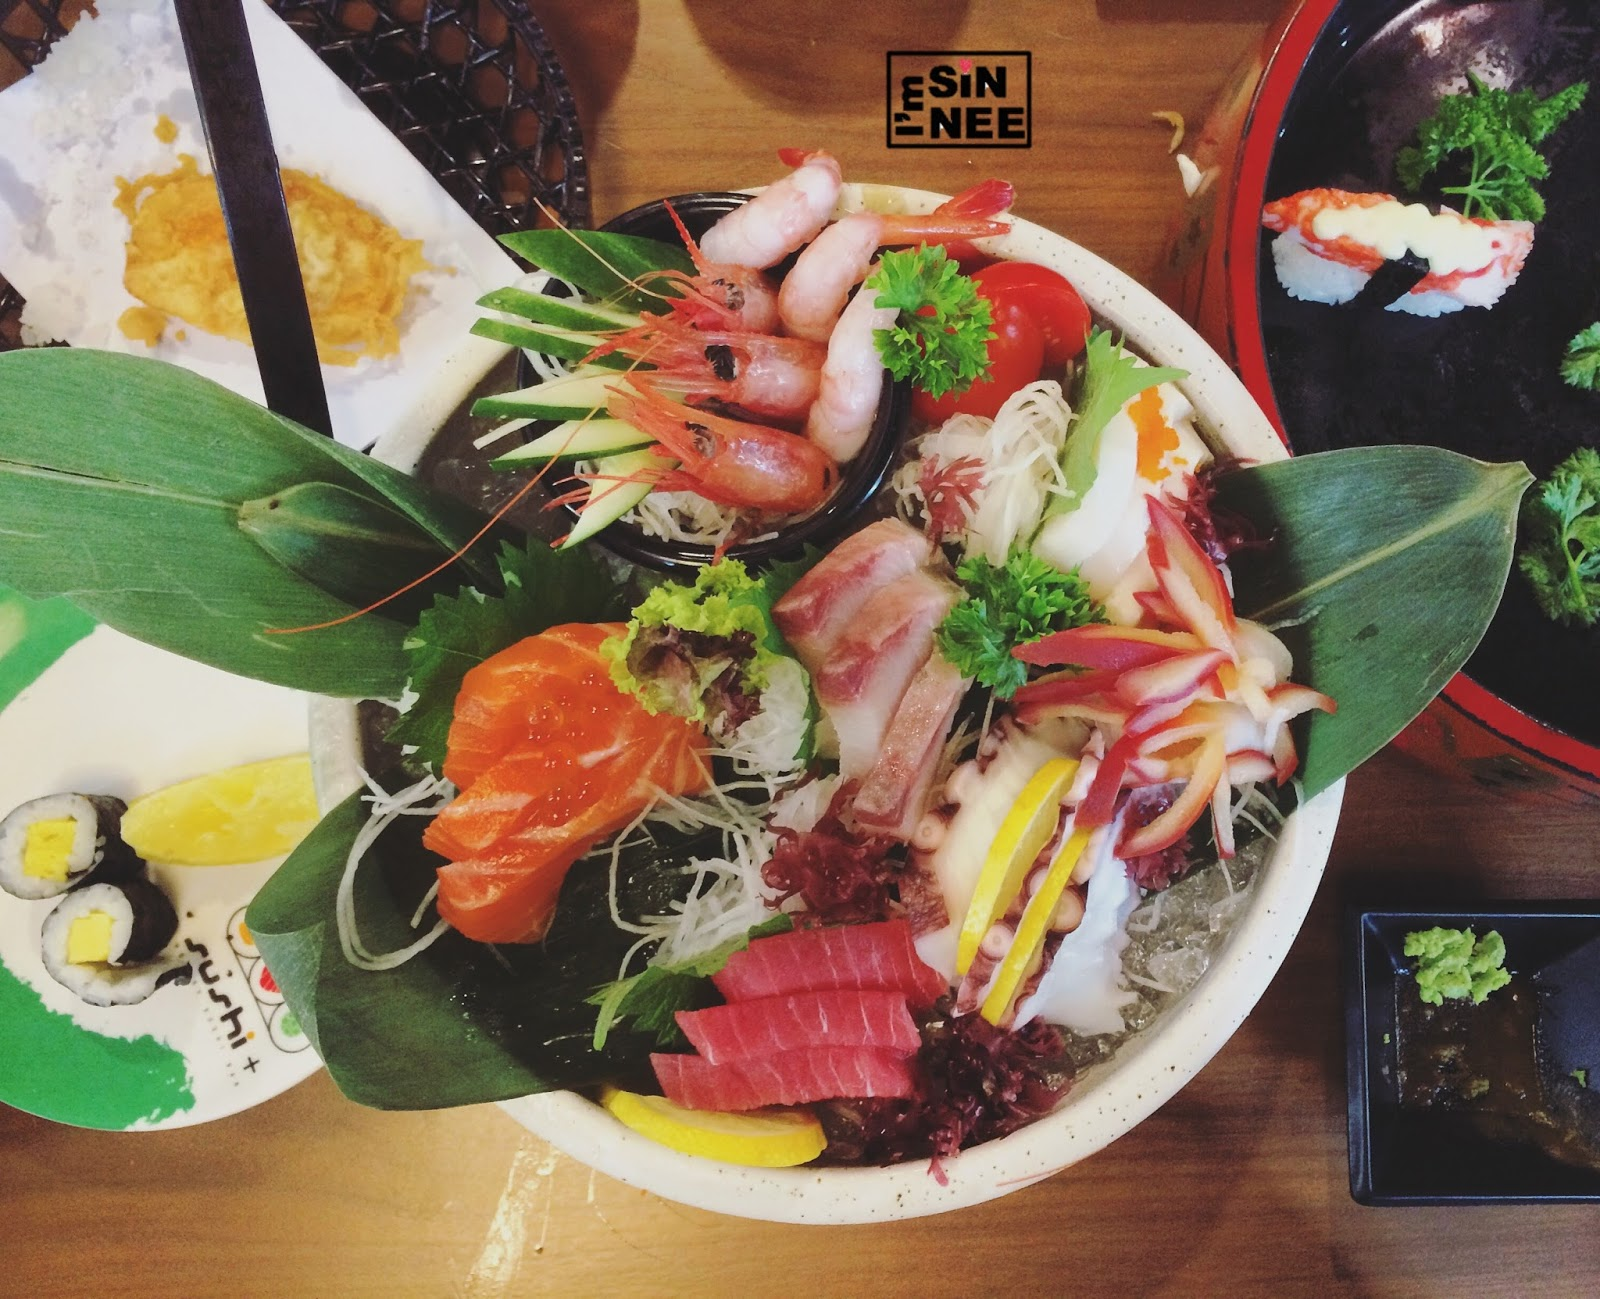 Sushi Rotary Sushi Bar Malaysia Bandar Puchong Jaya